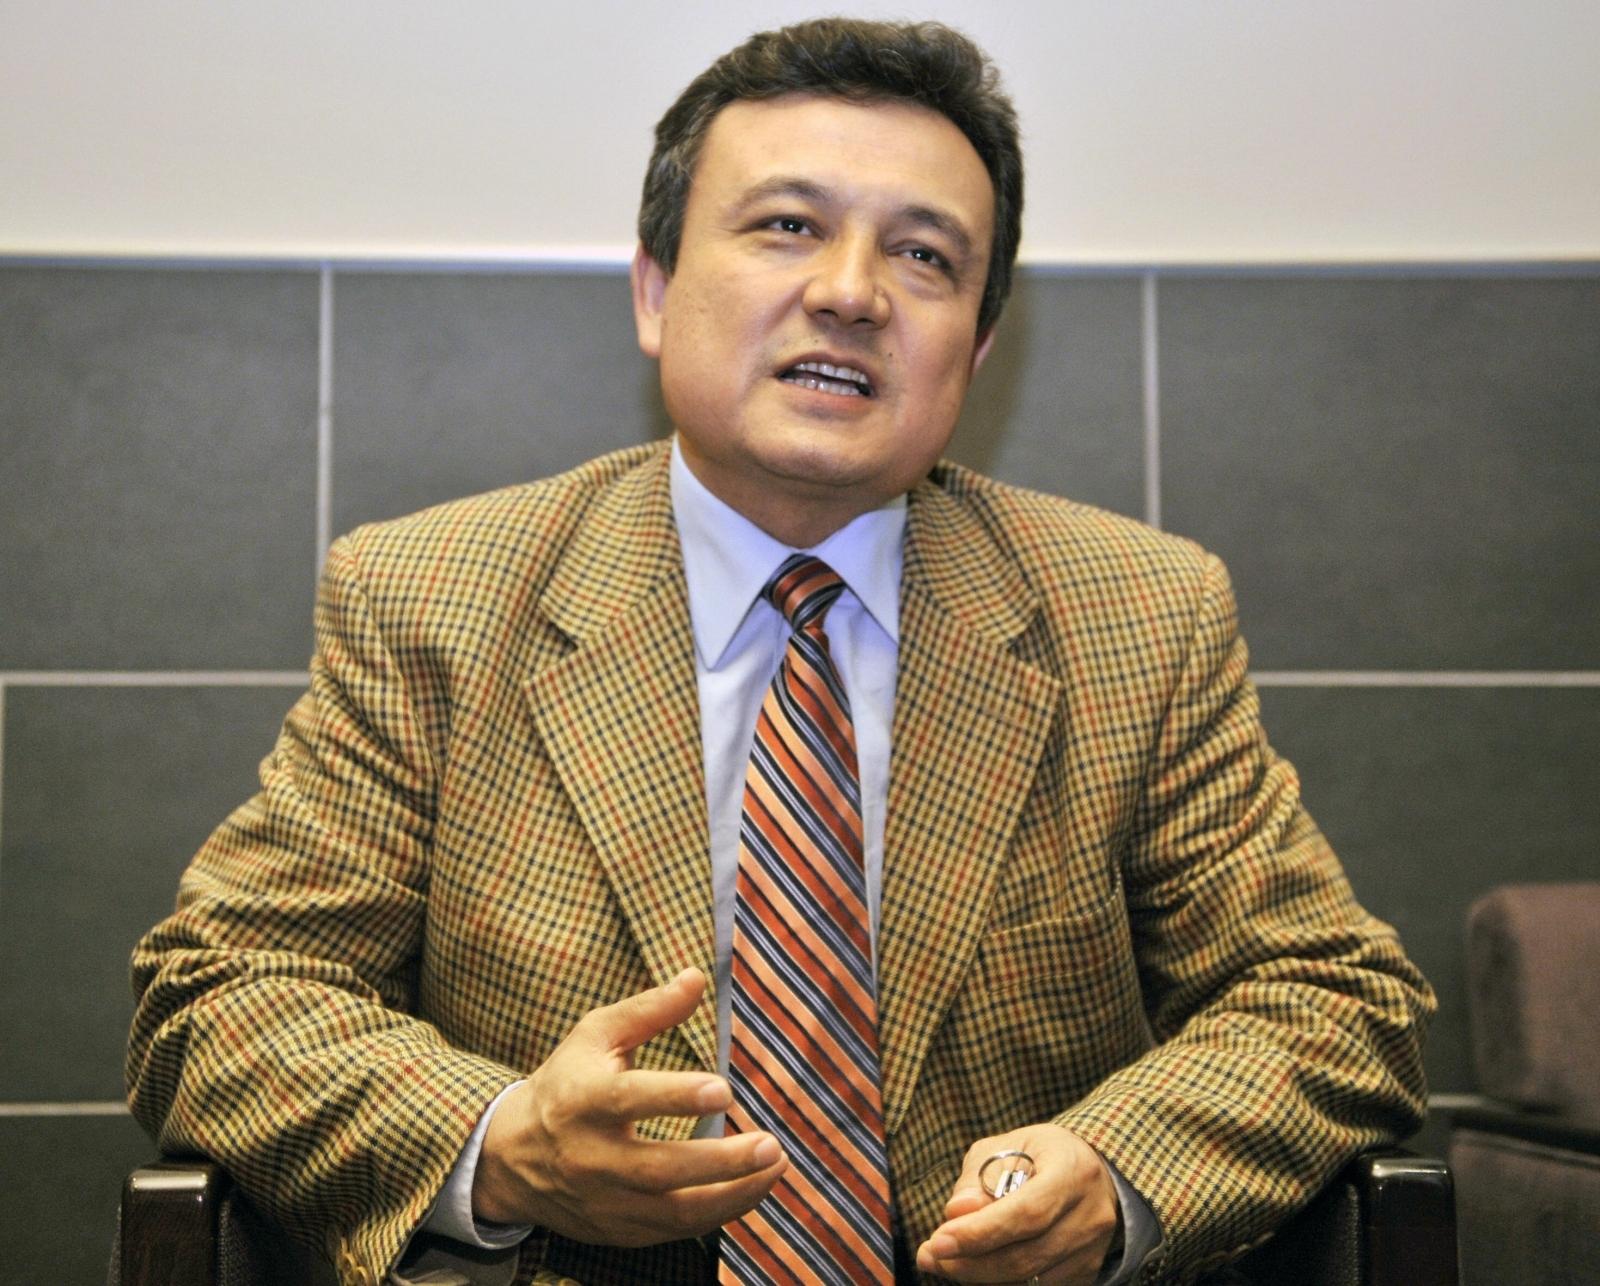 Dolkun Isa China Uighur Uyghur